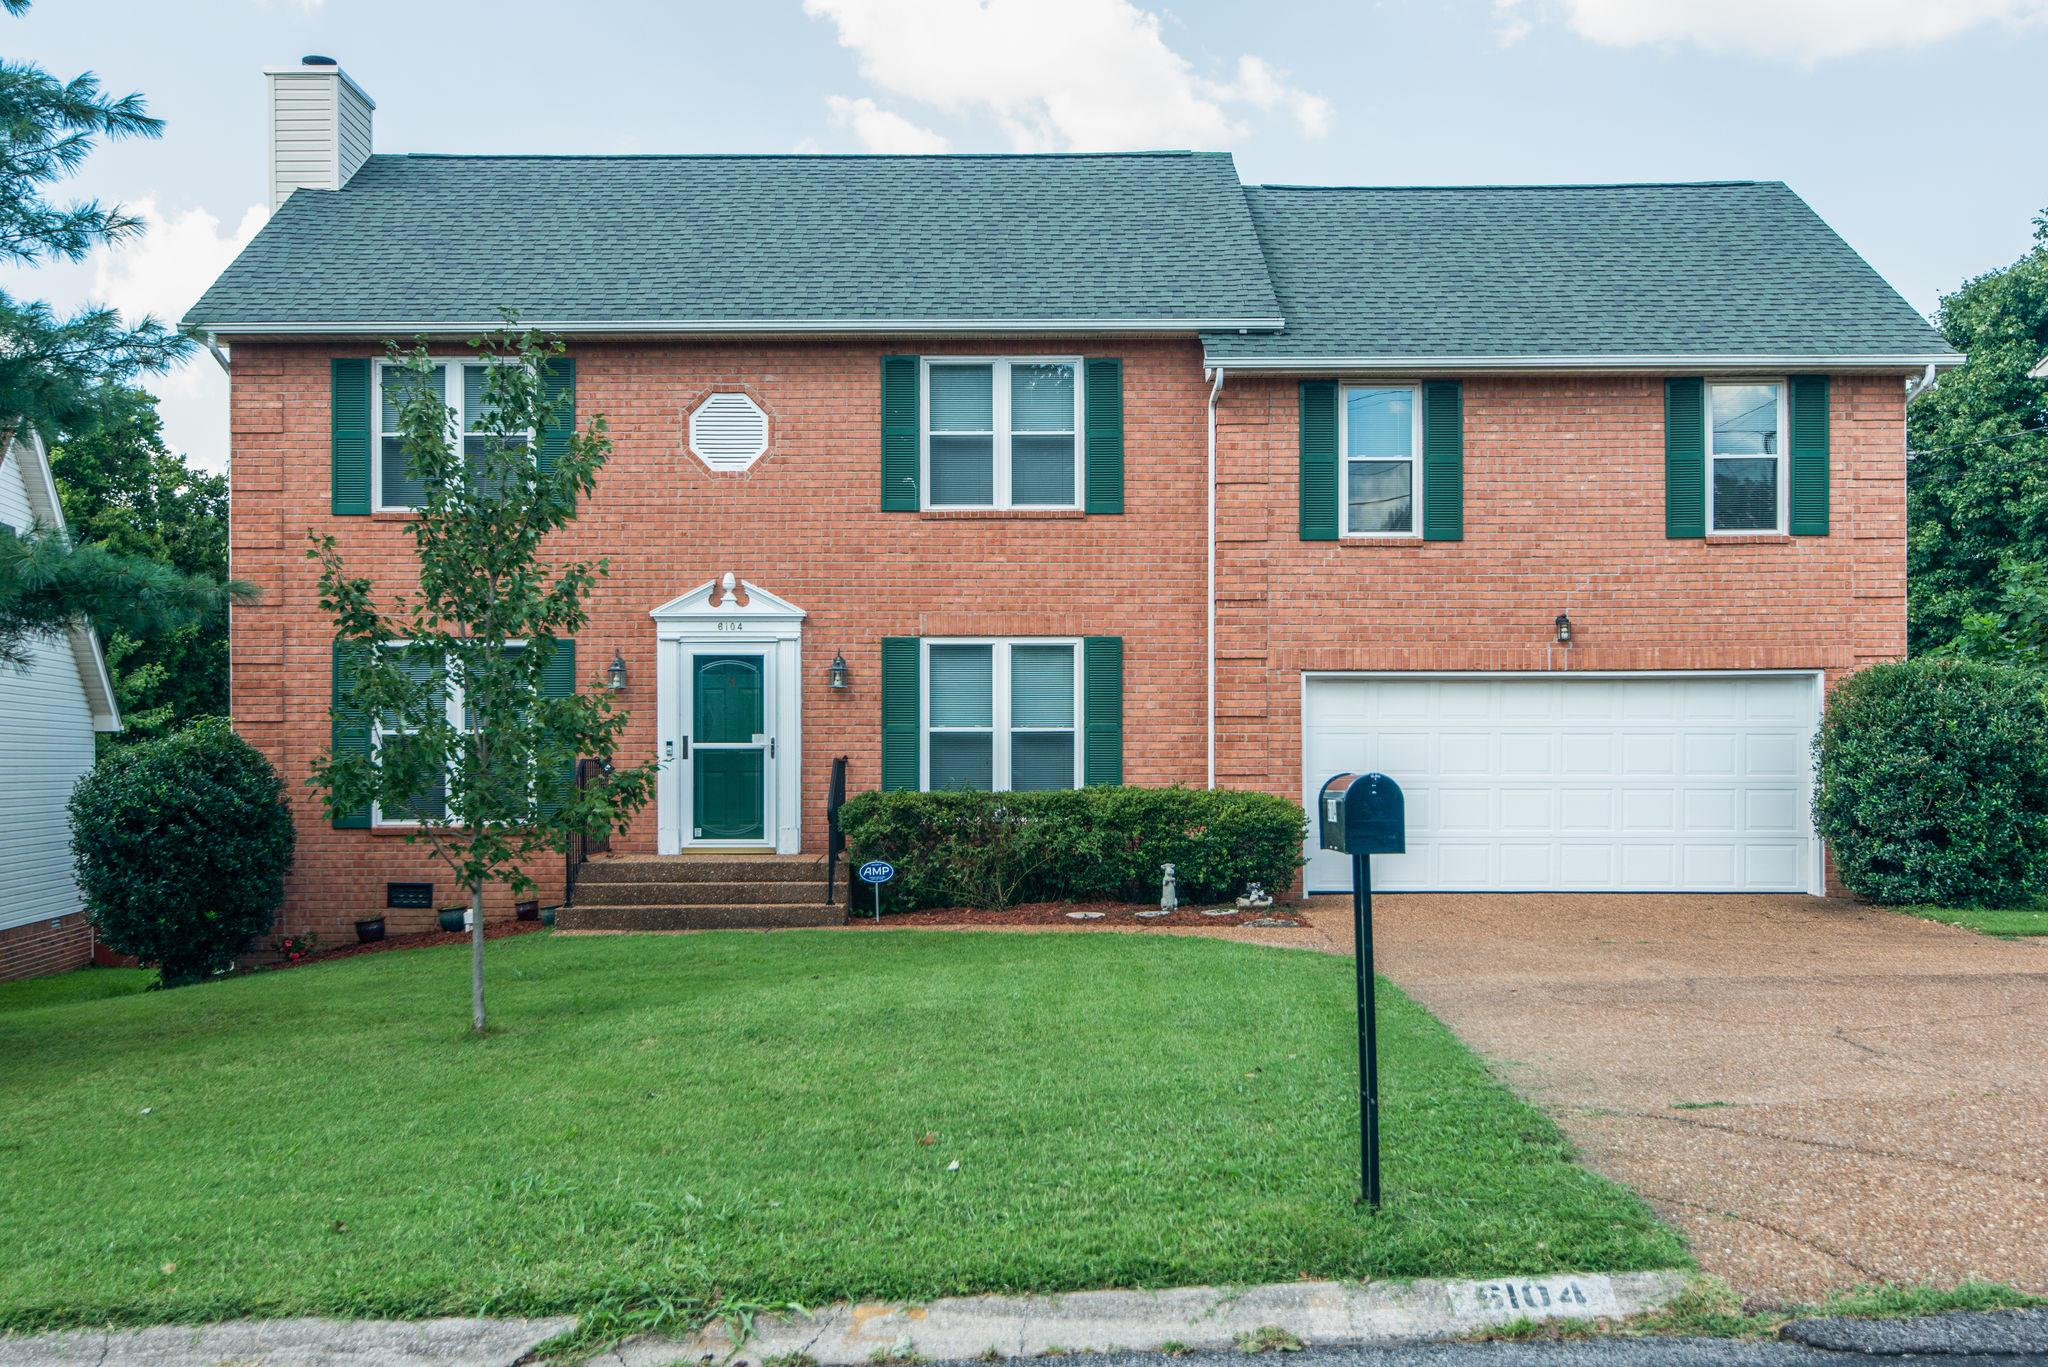 6104 Bradford Hills Dr, Nashville, TN 37211 - Nashville, TN real estate listing